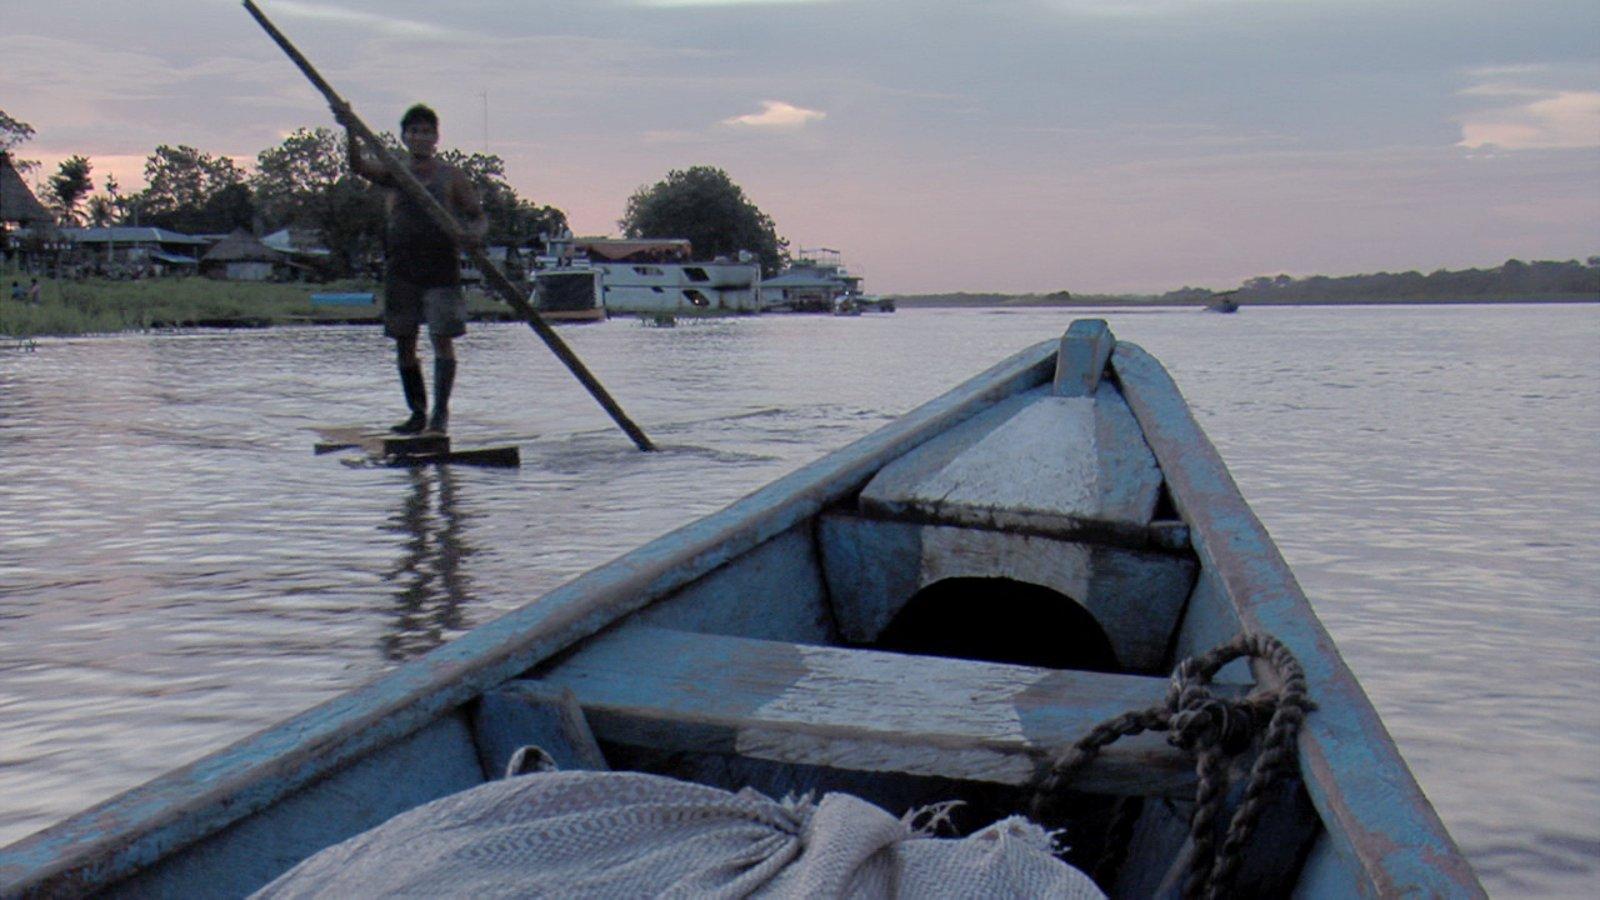 Margin - Journey on the Amazon River